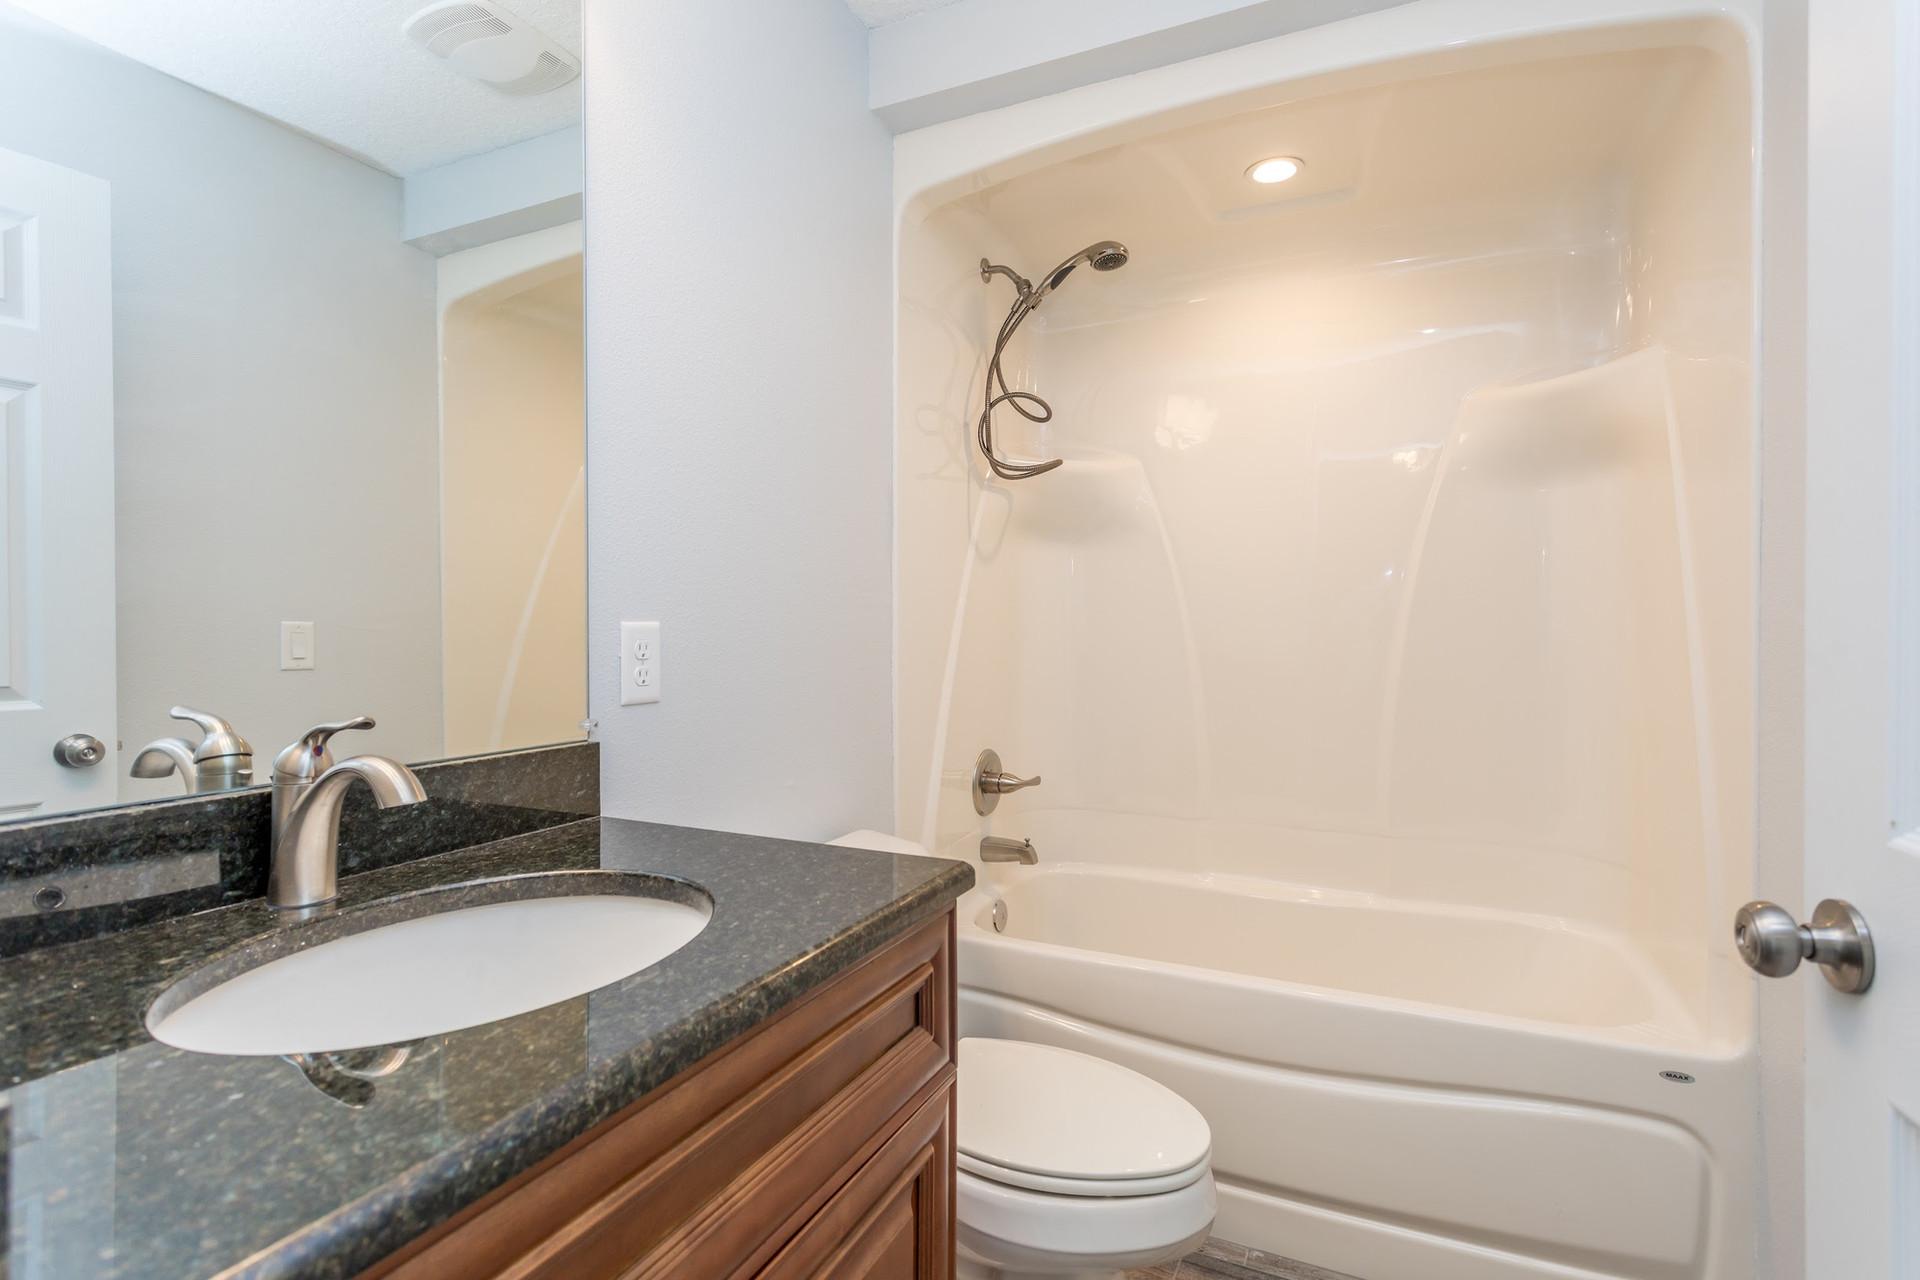 LEDGESTONE guest bathroom